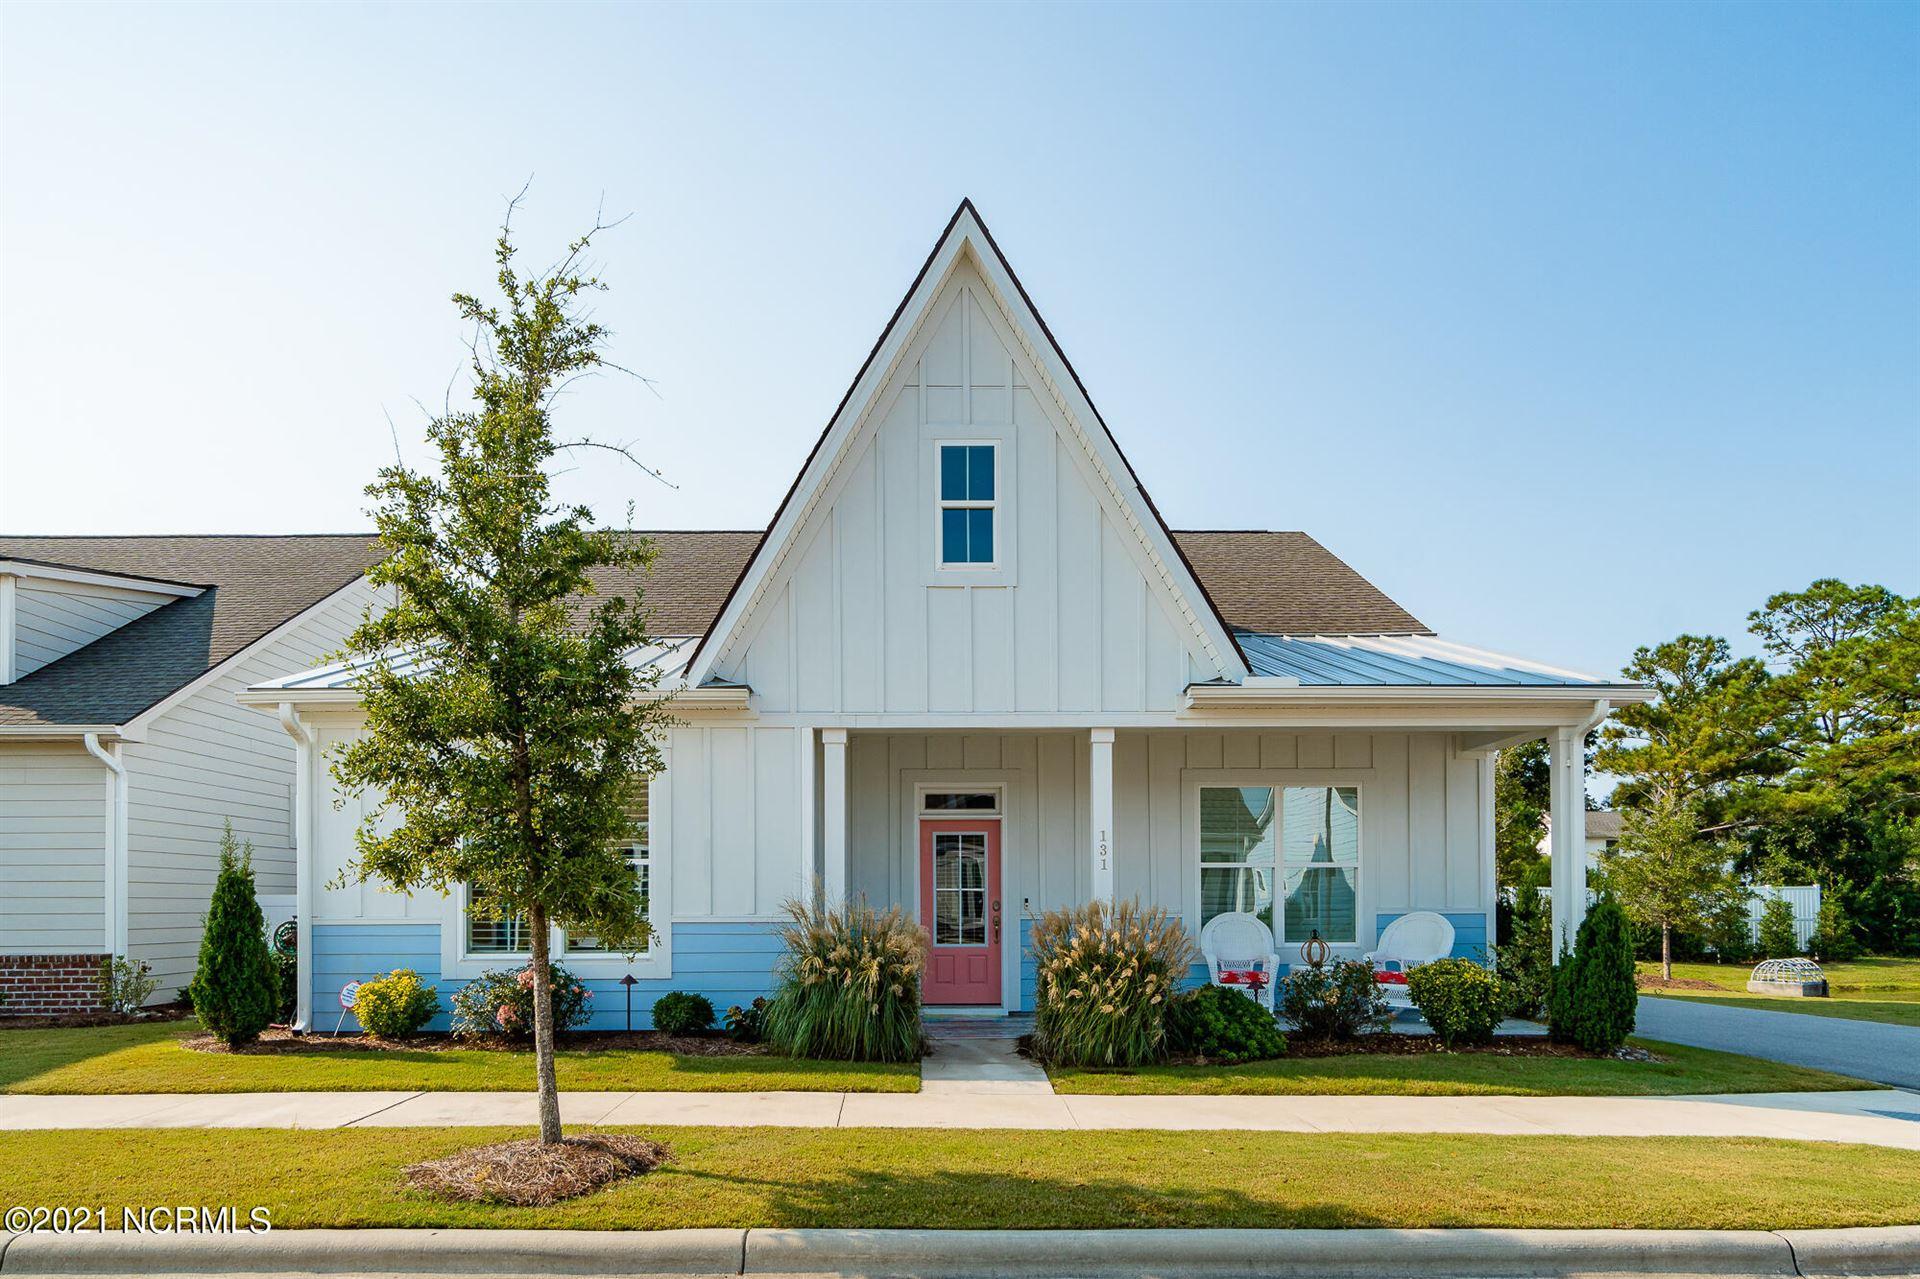 Photo of 131 Gray Duck Drive Drive, Beaufort, NC 28516 (MLS # 100290554)